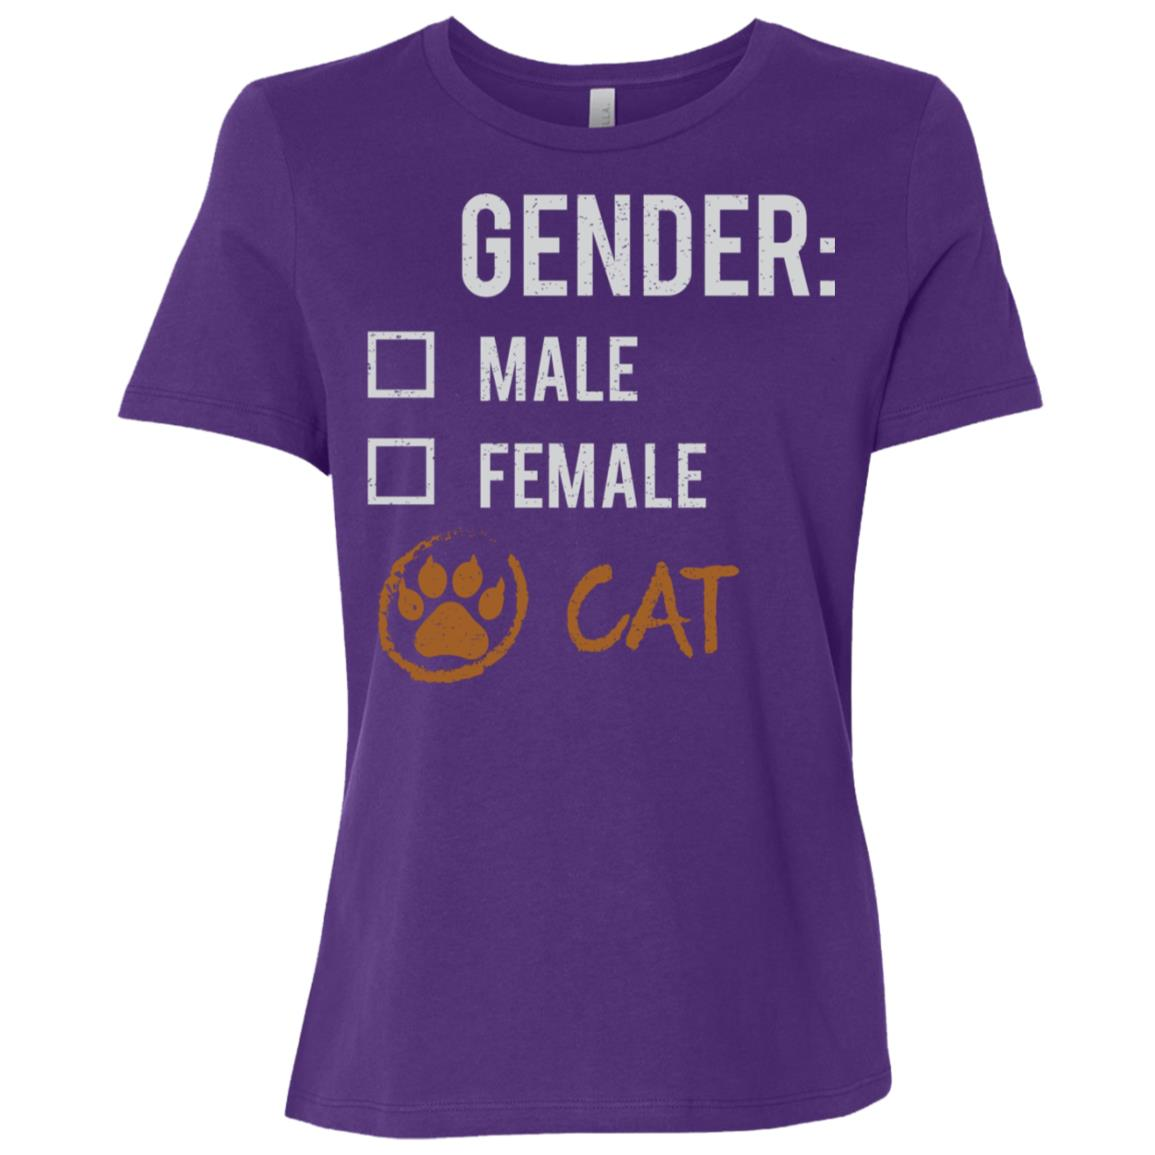 Male Female Cat Gender Nonbinary Trans Women Short Sleeve T-Shirt